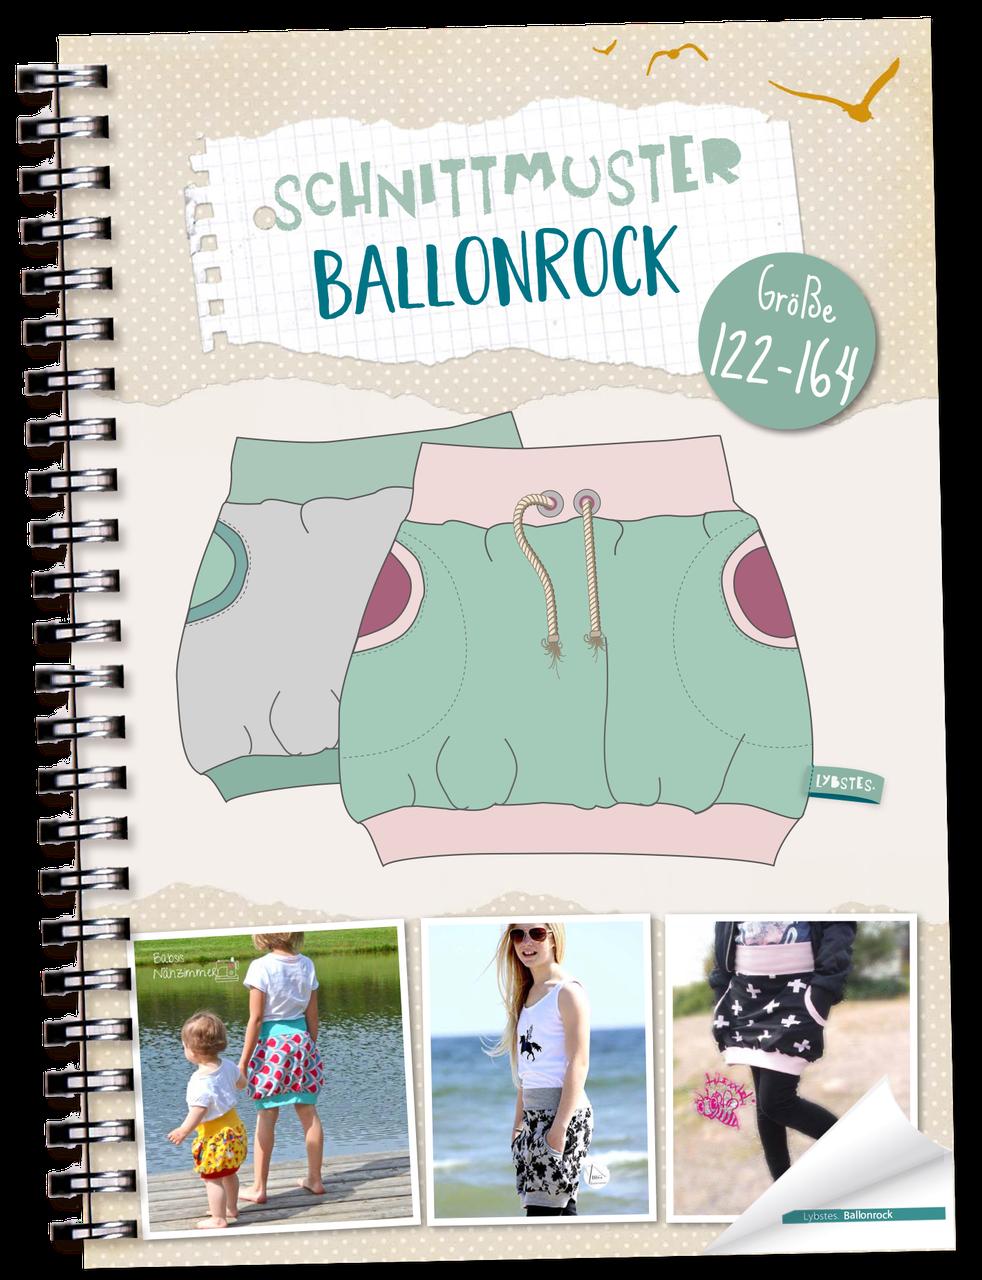 Lybstes. Ballonrock *KIDS* Gr. 122-164 | E-BOOK